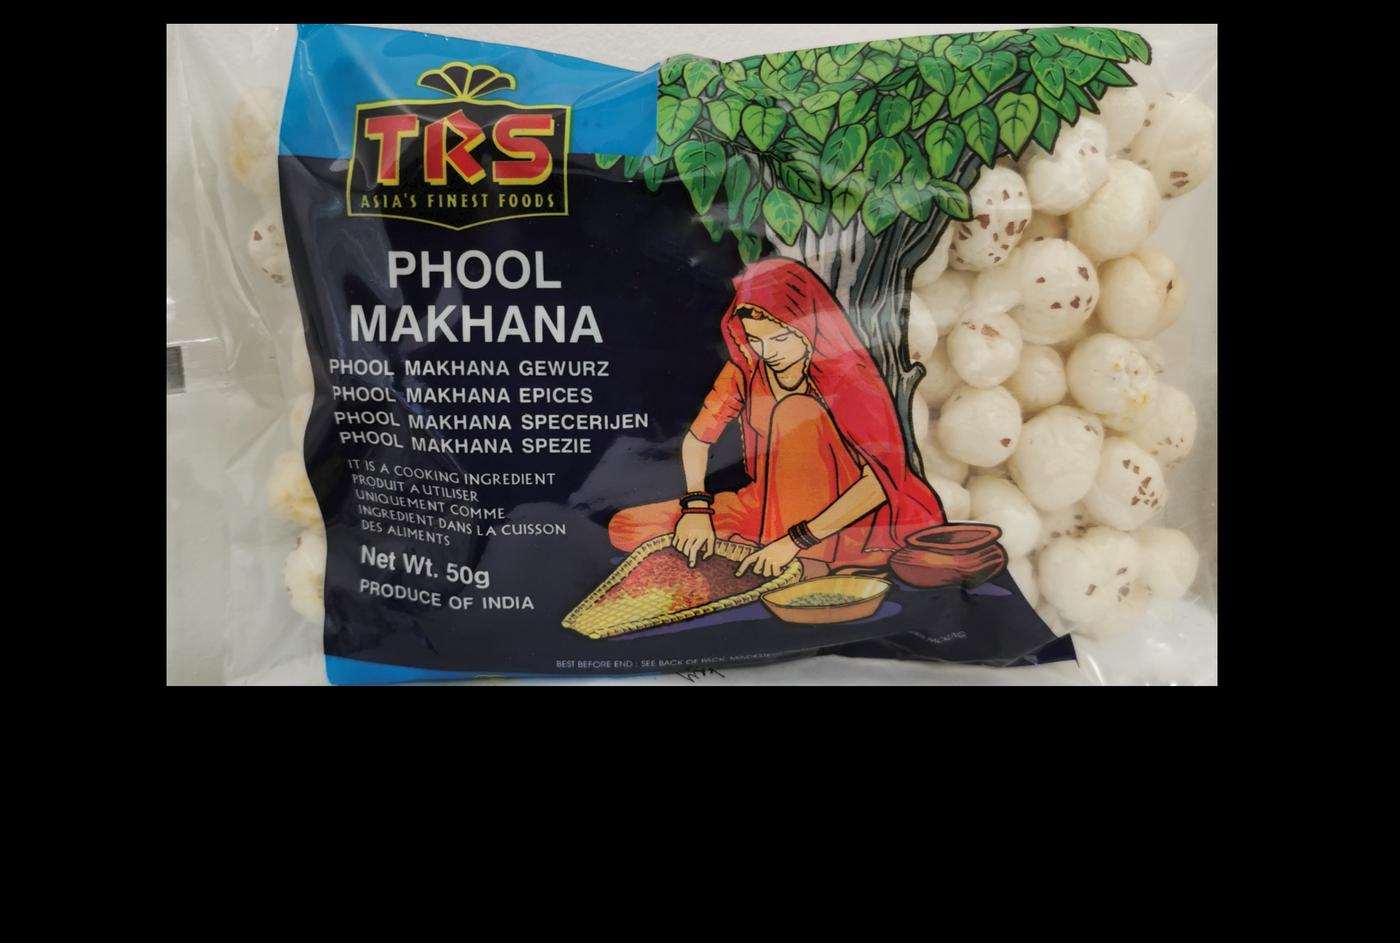 TRS Phool Makhana